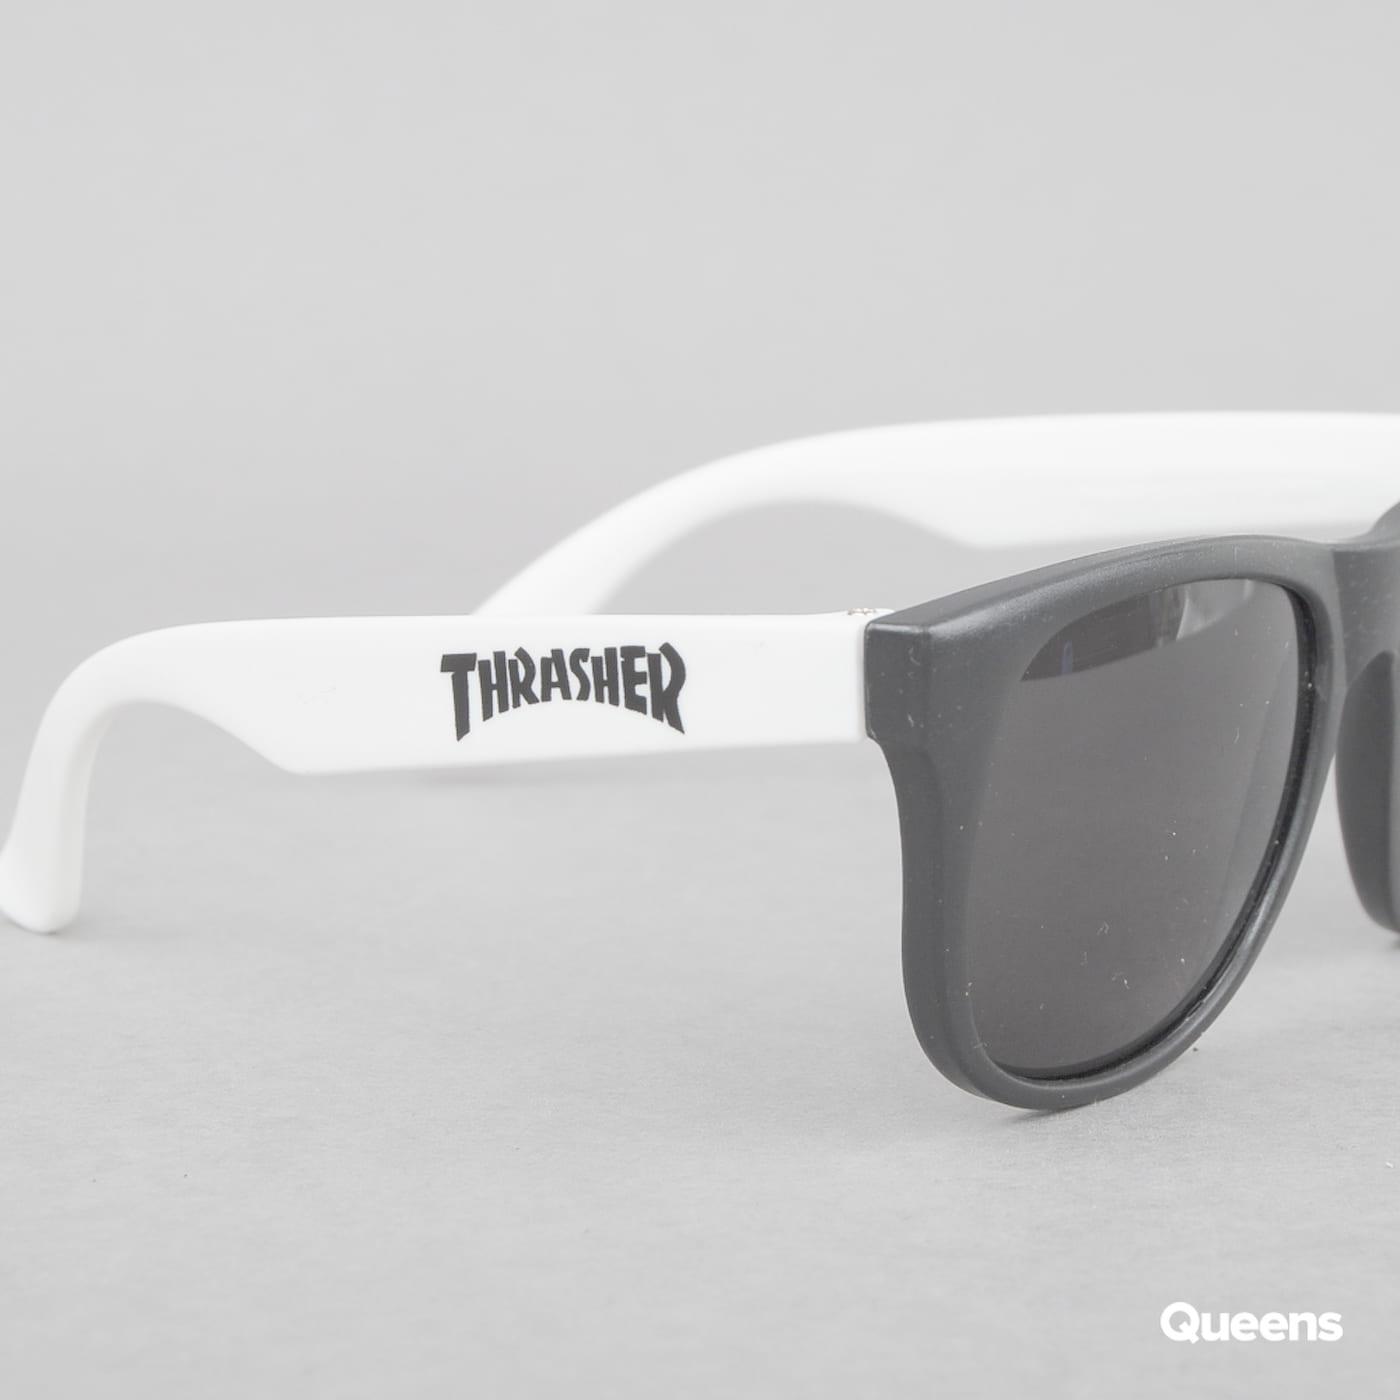 Thrasher Thrasher Sunglasses čierne / biele